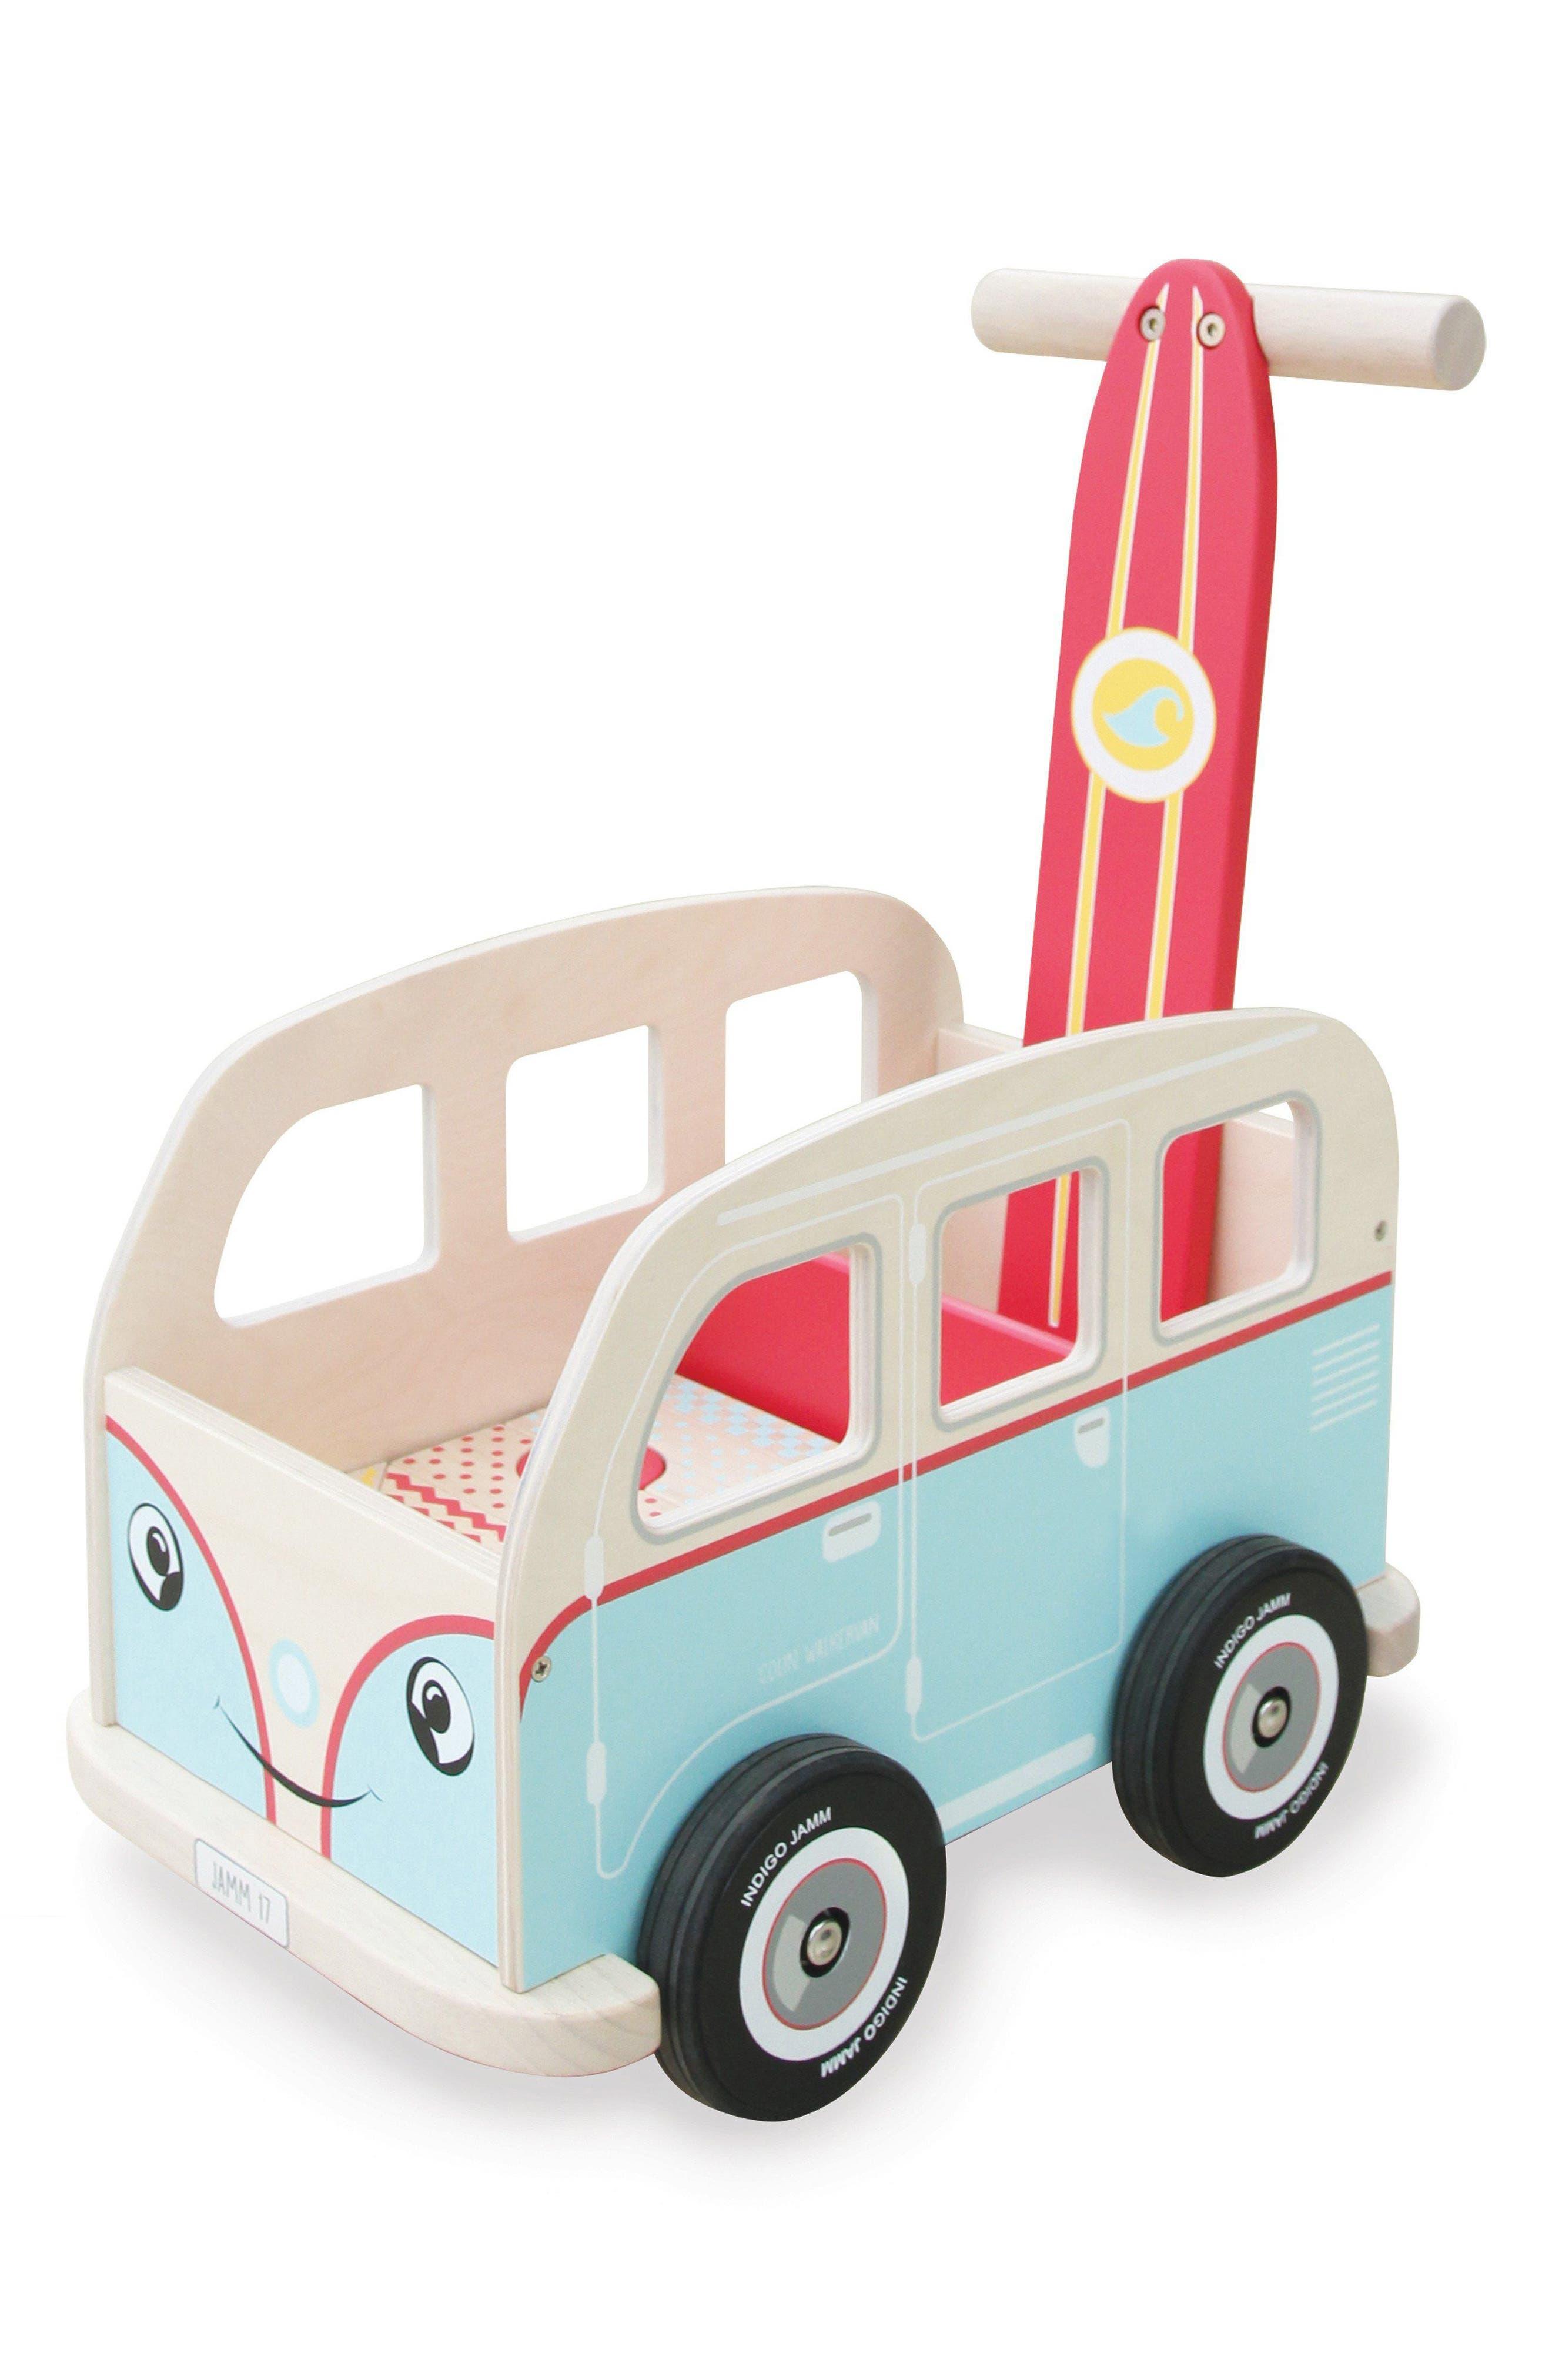 Van Push Toy,                             Main thumbnail 1, color,                             400